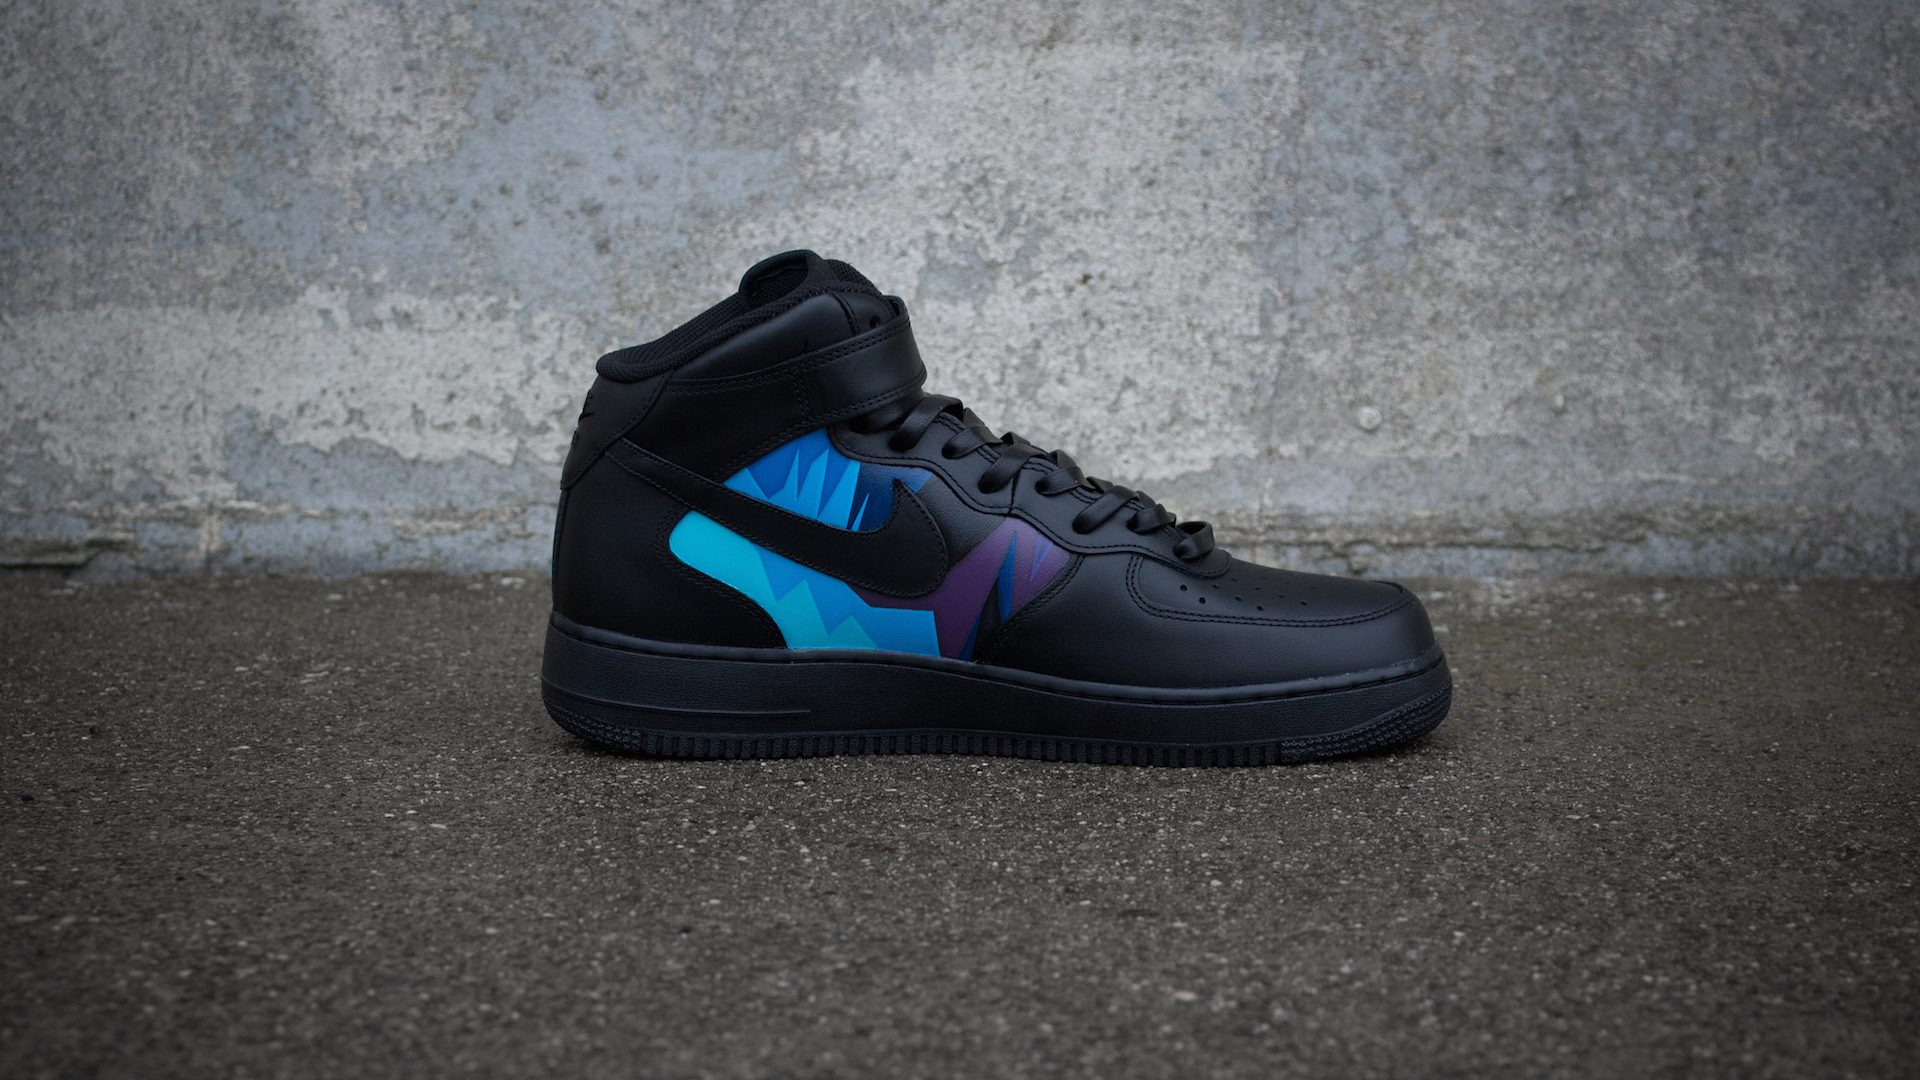 online store 292ae bc025 ... Nike Air Force 1 Mid NBA Black  IMG 1586 IMG 1559 IMG 1569 IMG 1462 IMG  1464 .